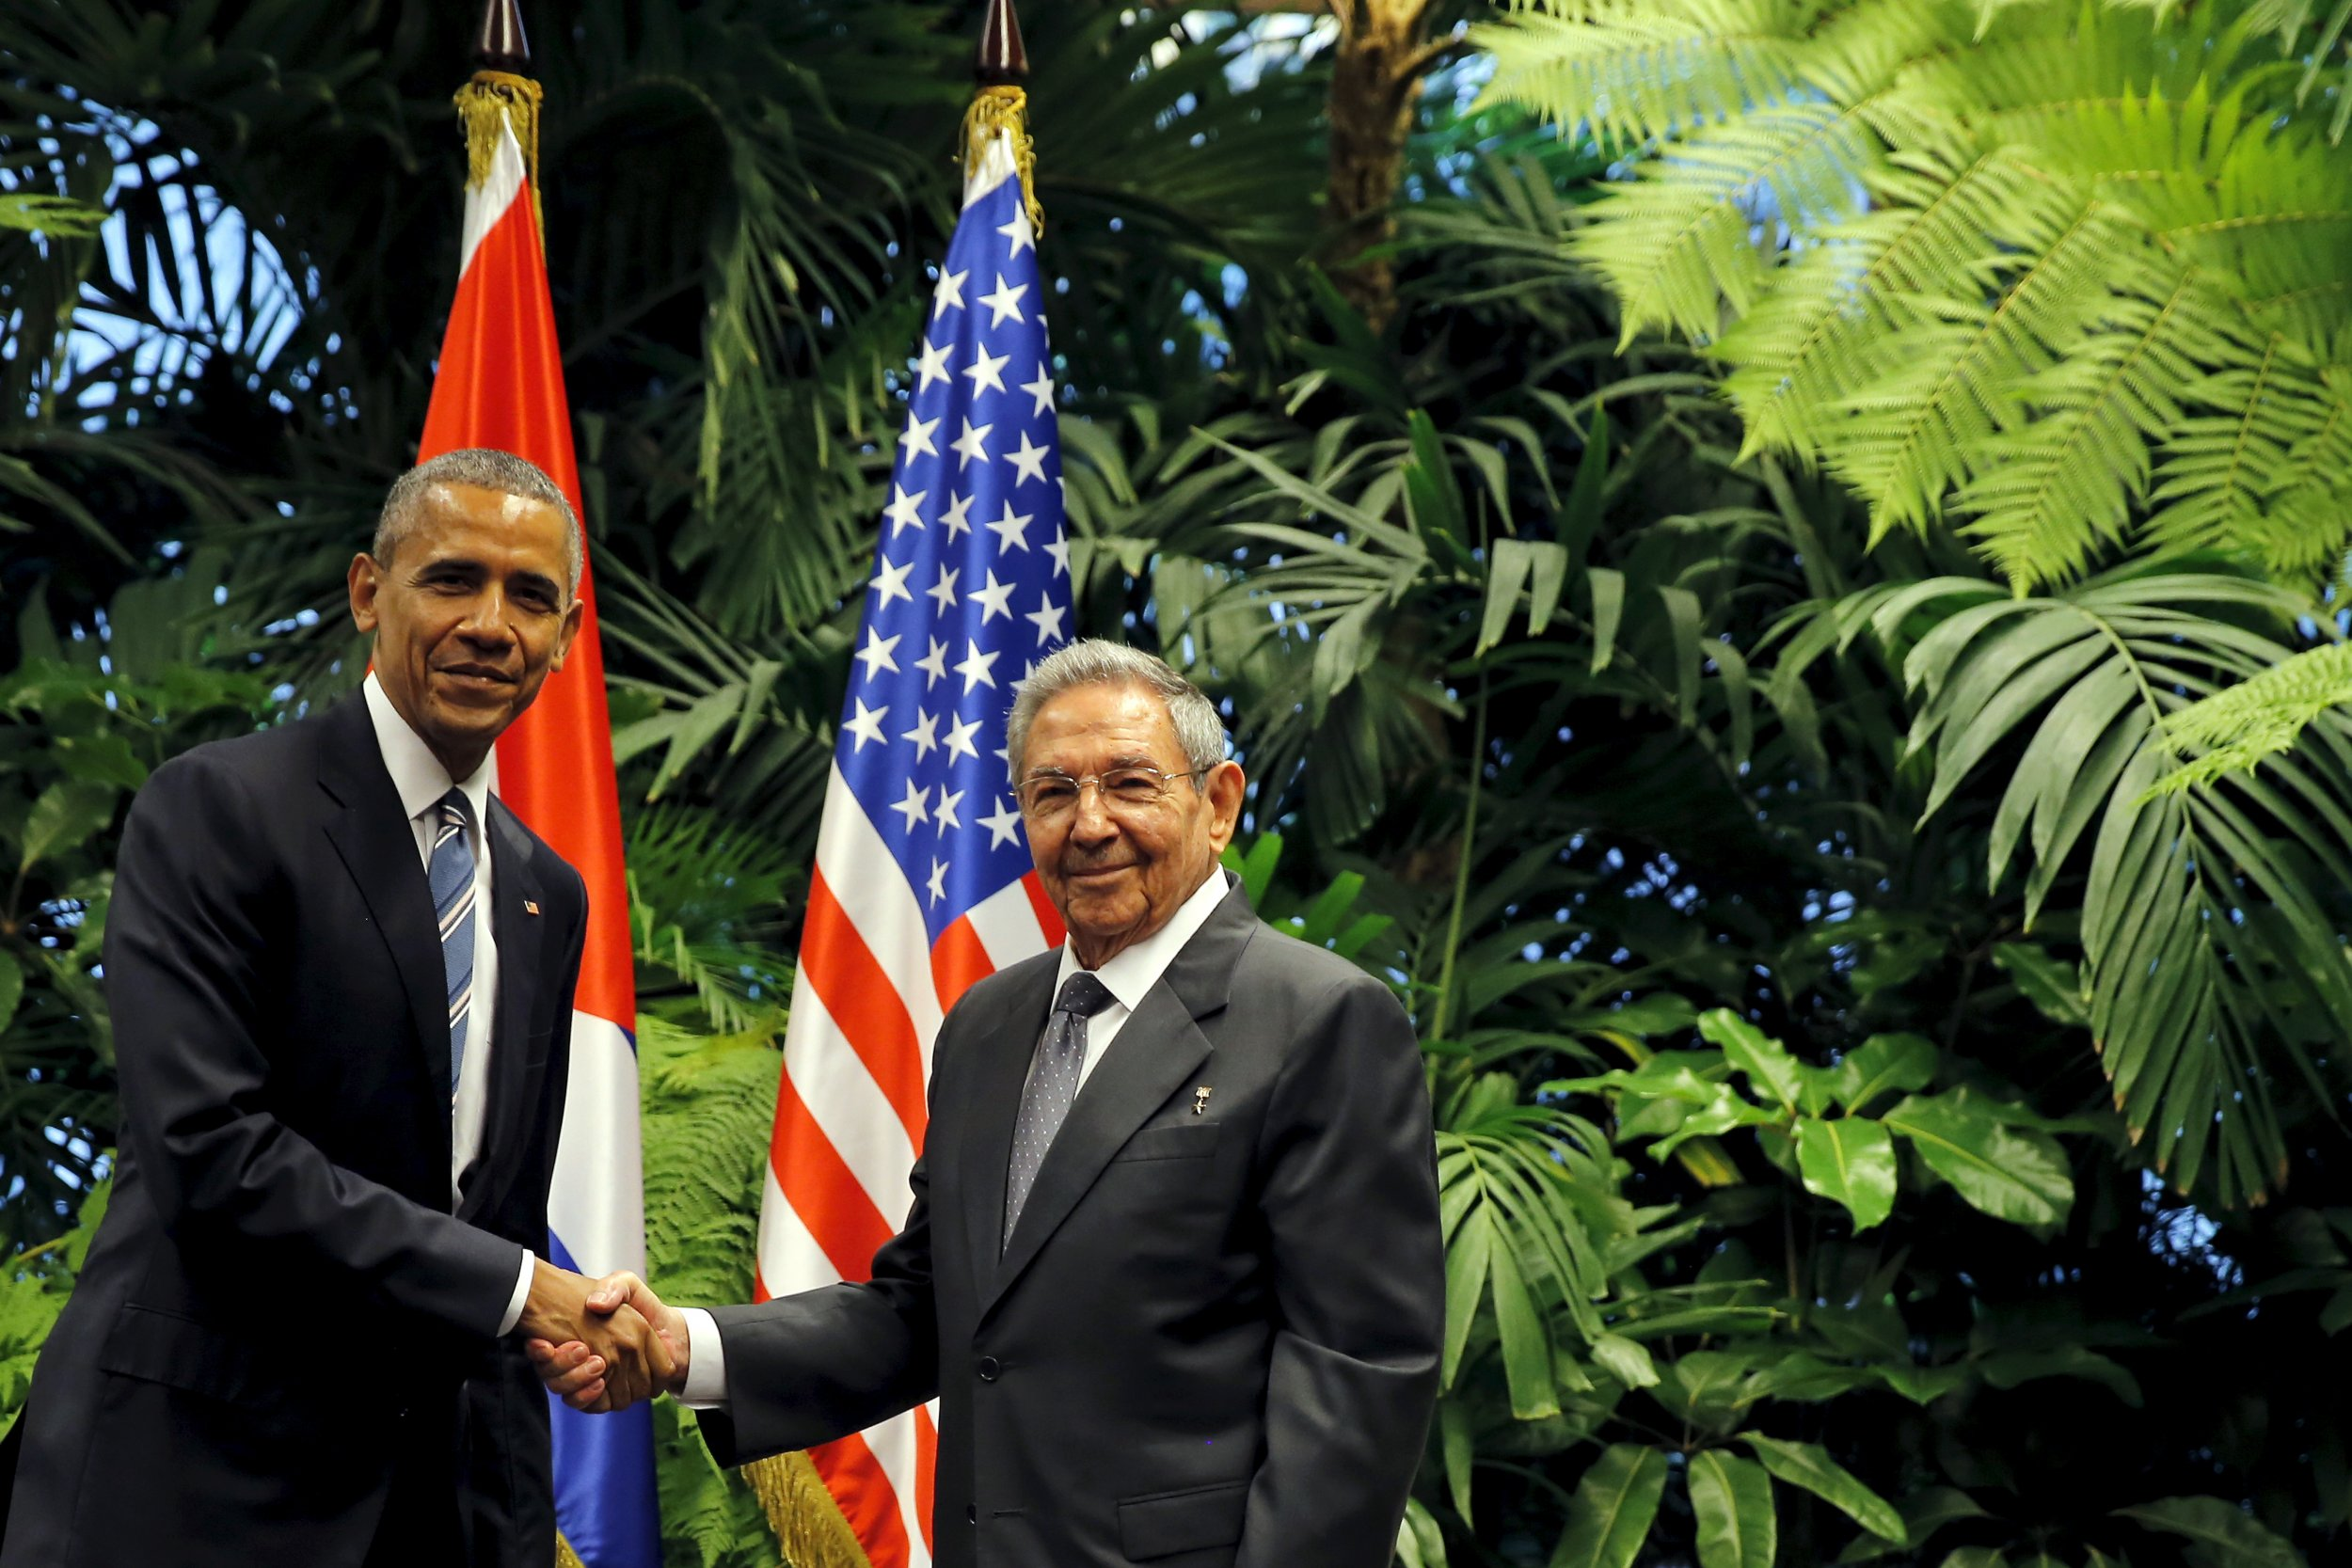 03_21_Obama_Cuba_01